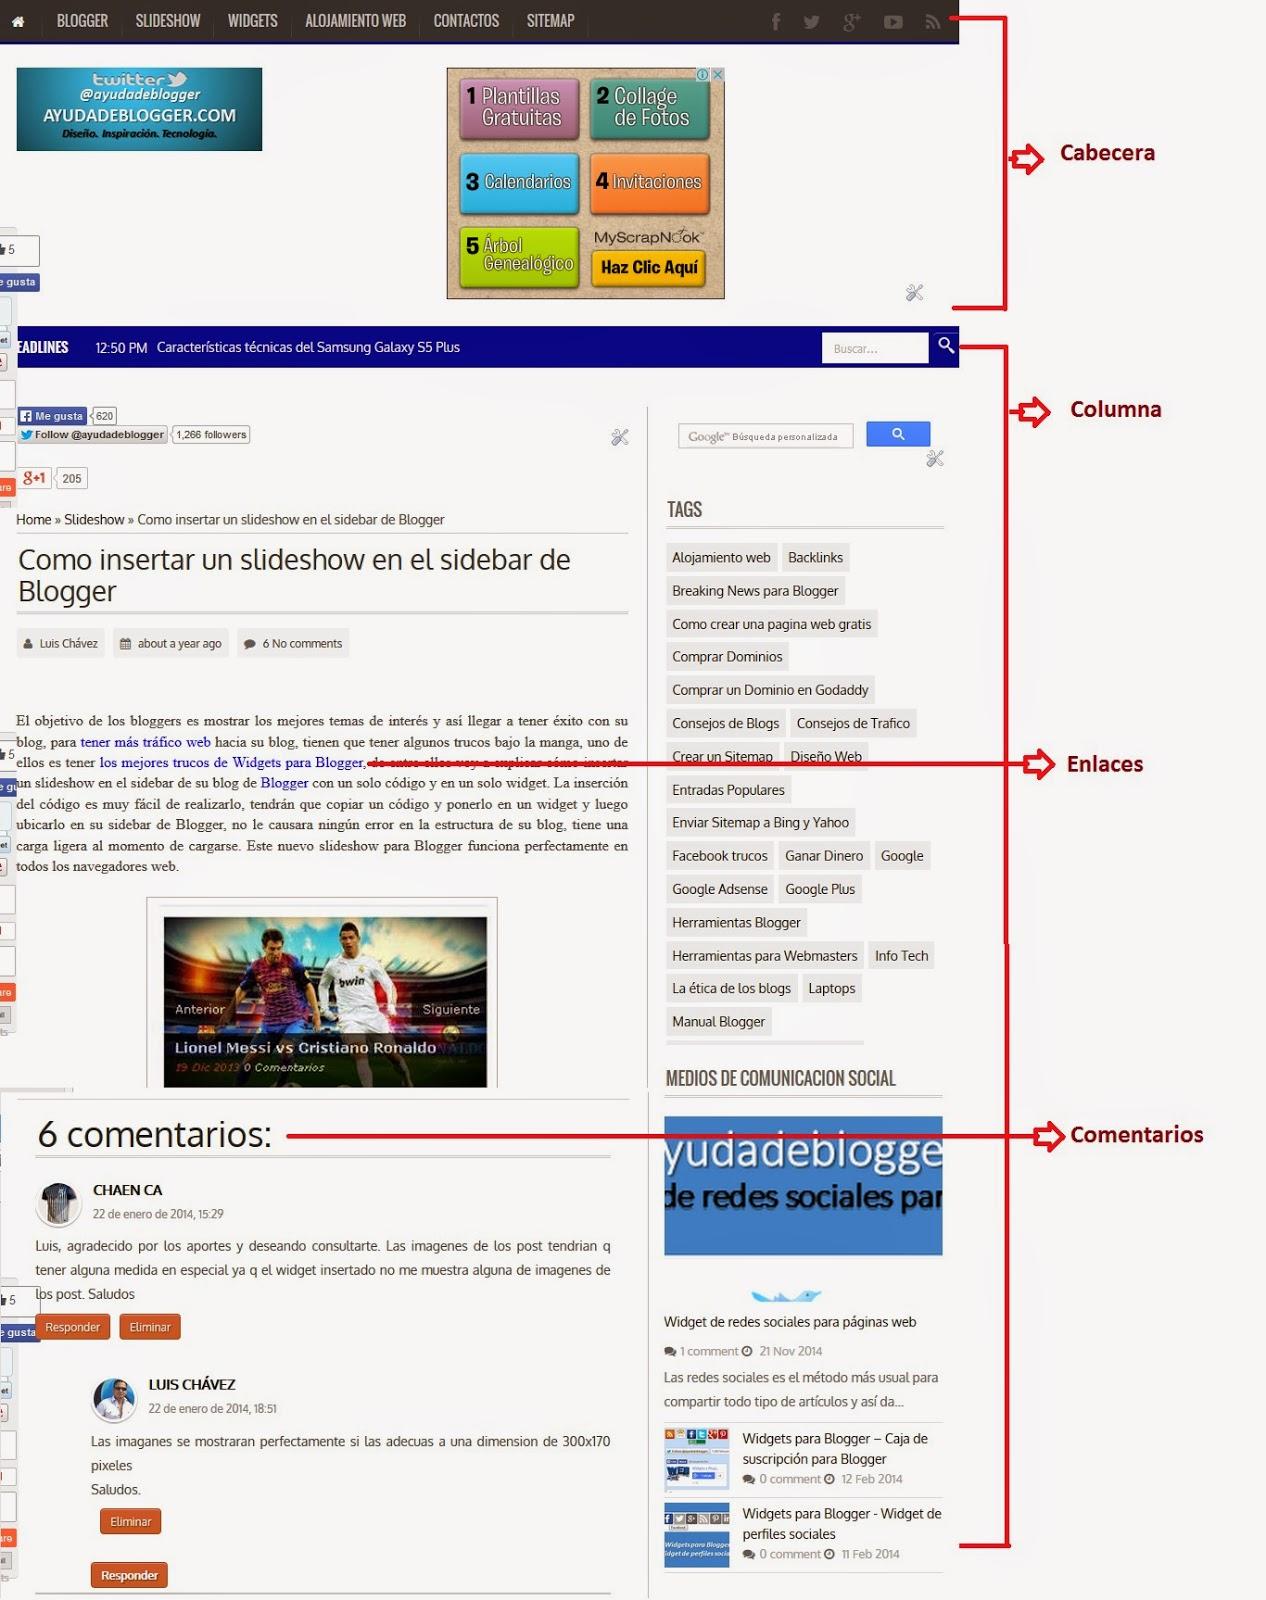 ¿Cuál es la estructura de un blog?